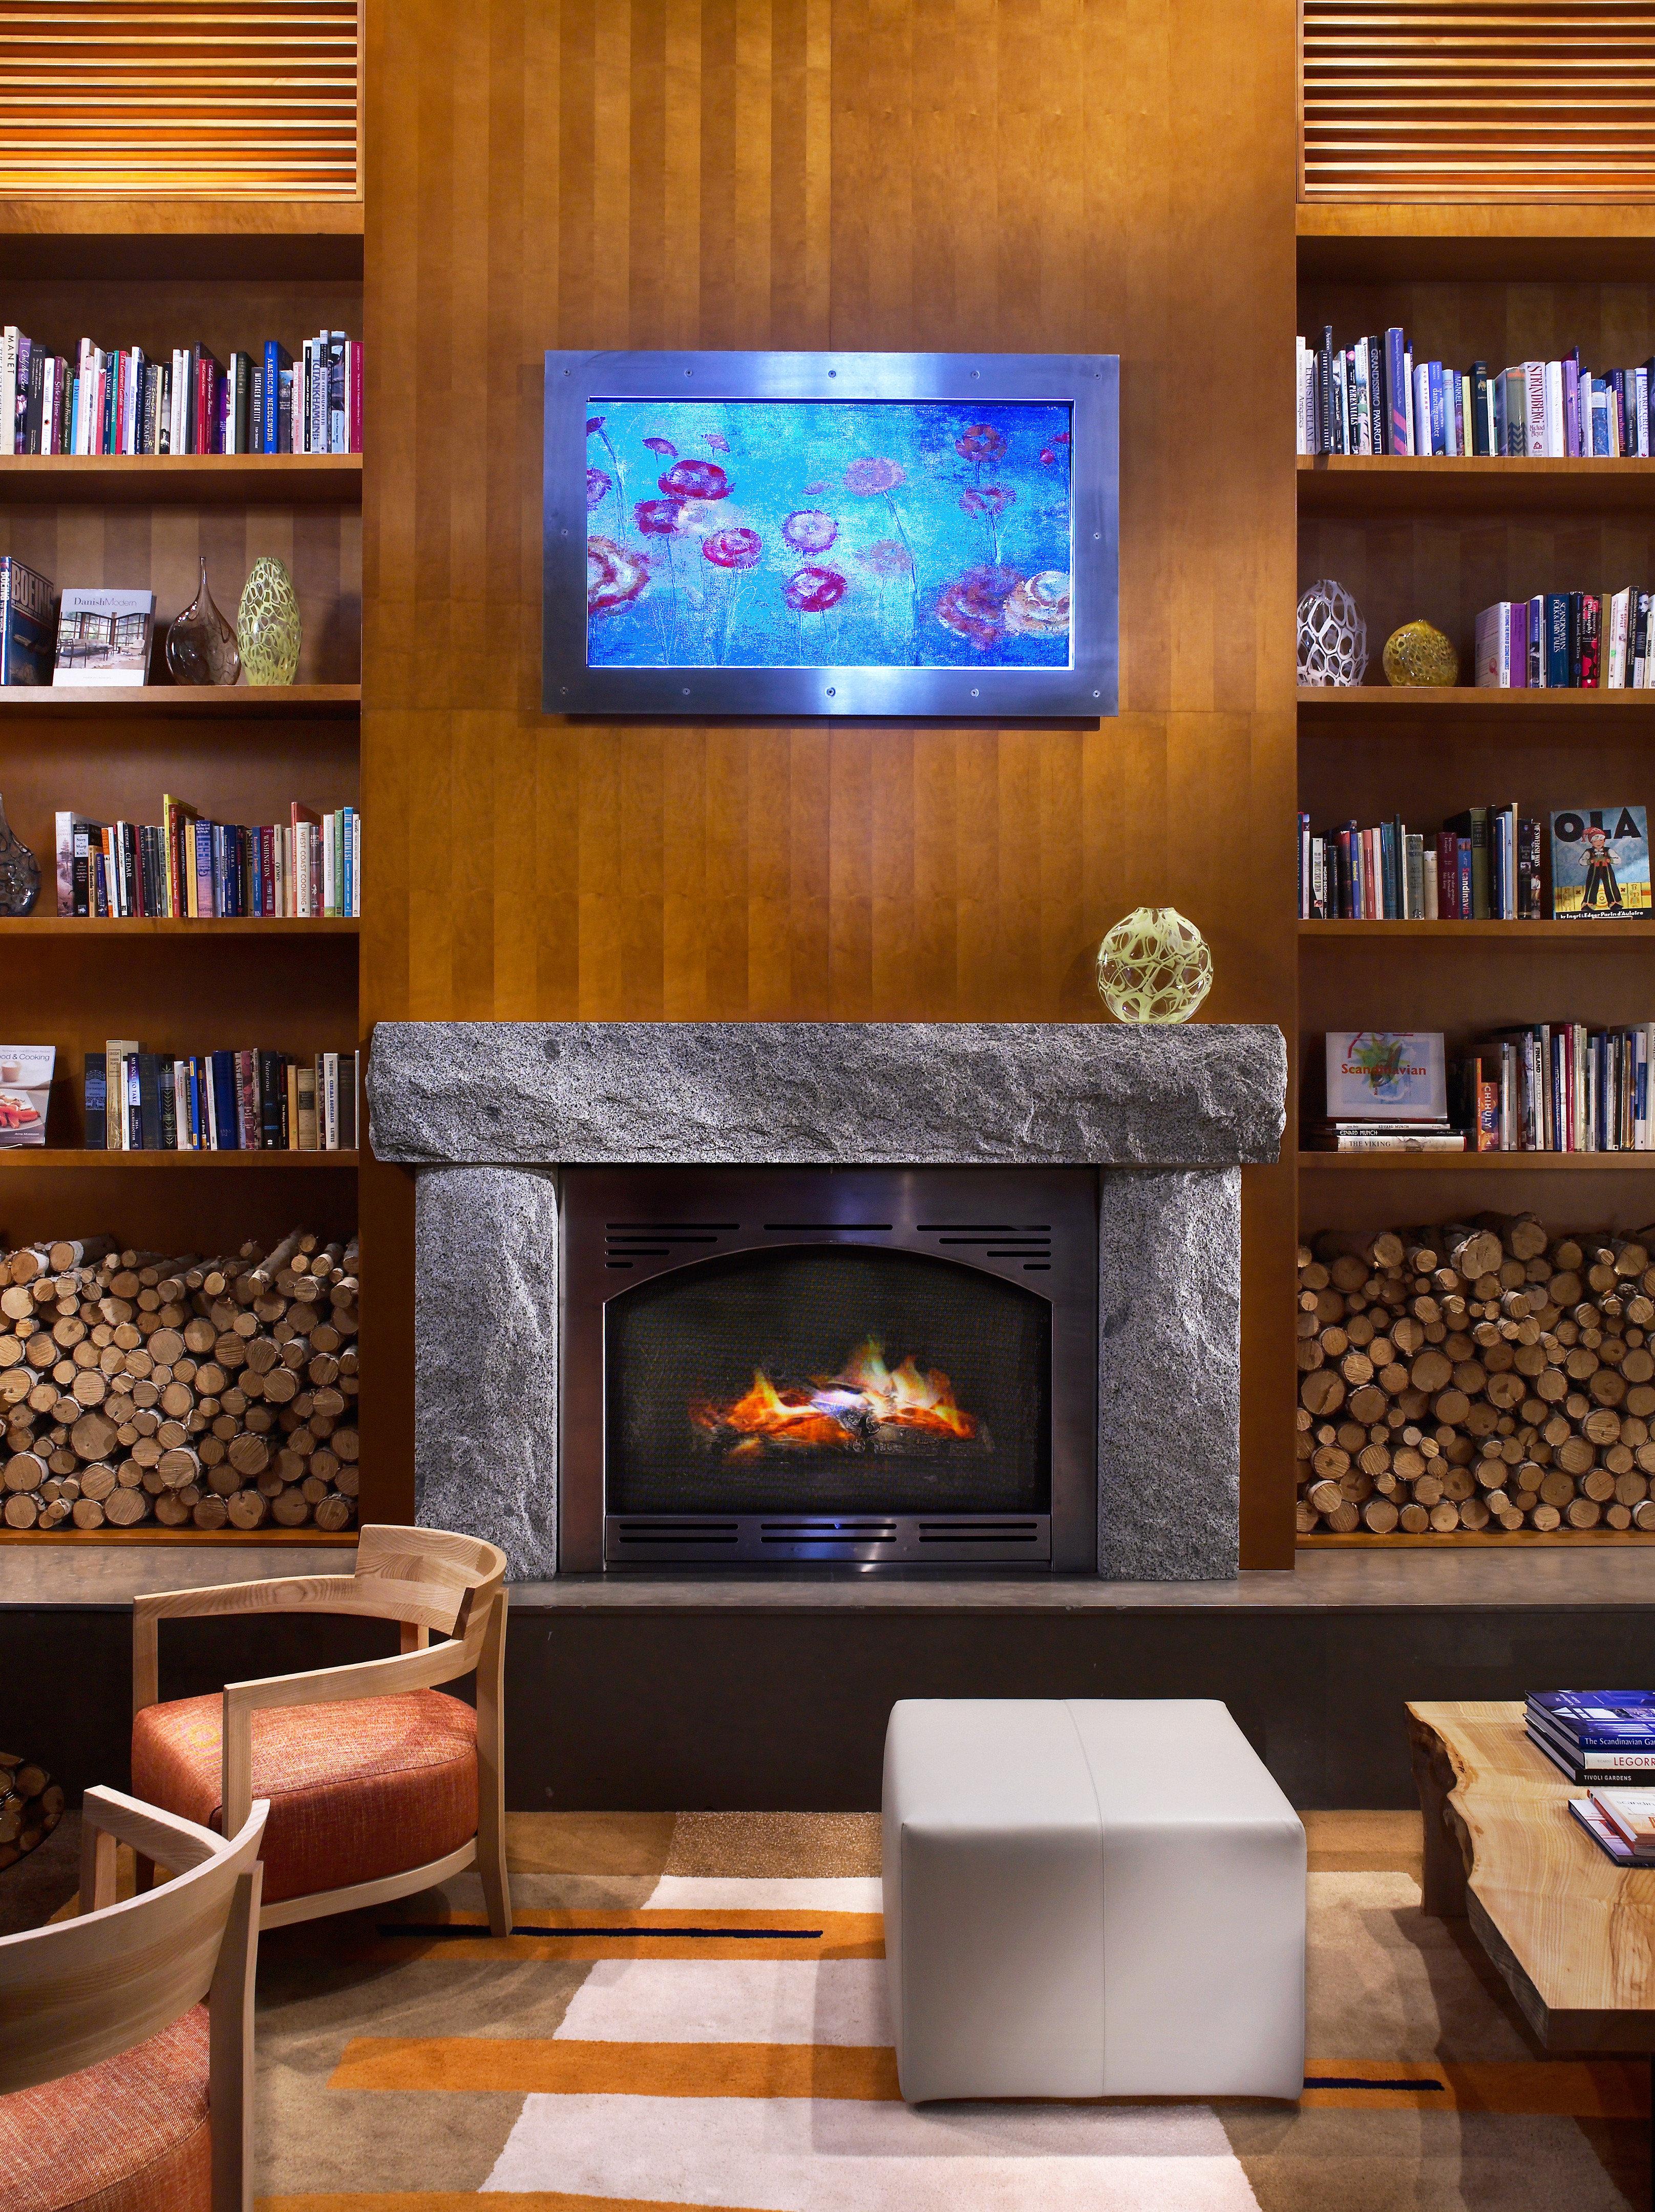 Budget City Fireplace Lobby shelf book living room home hardwood recreation room